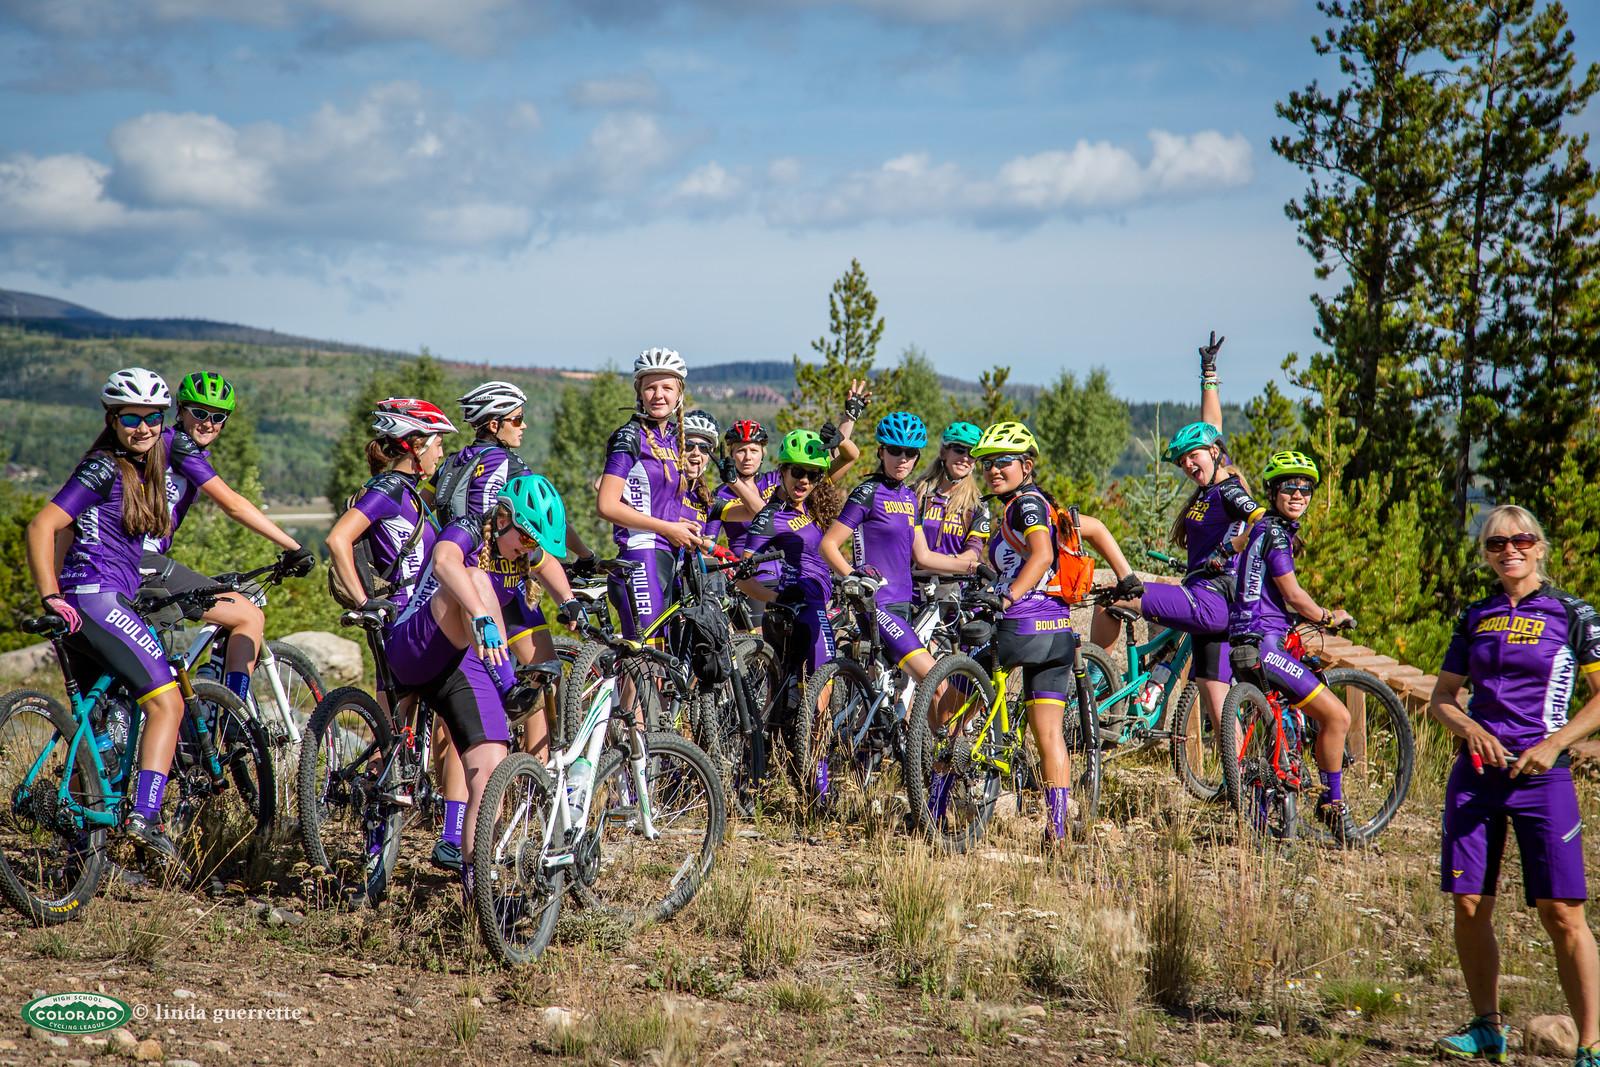 Boulder Girl's team